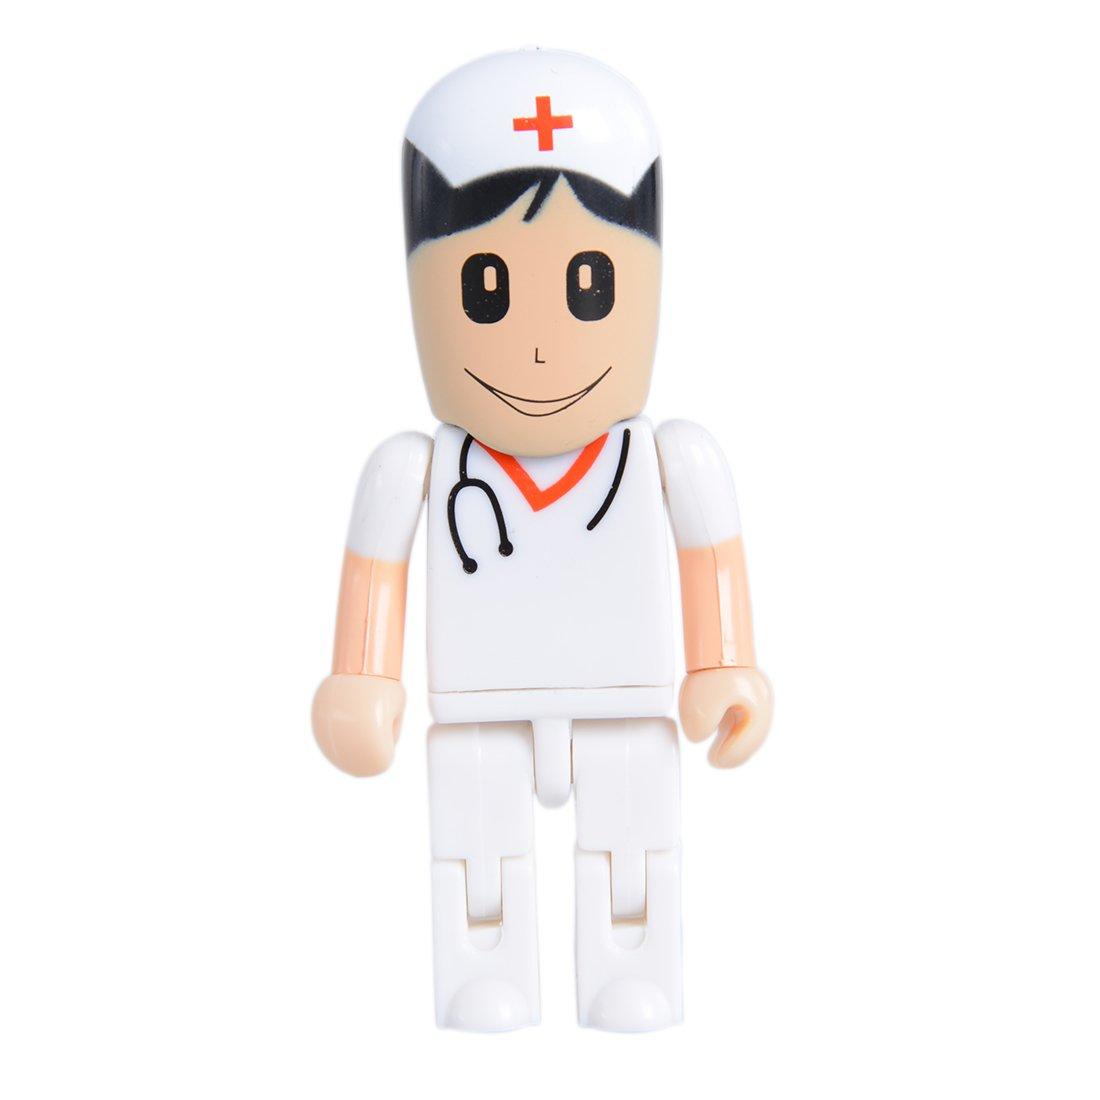 Nurse USB Flash Drive